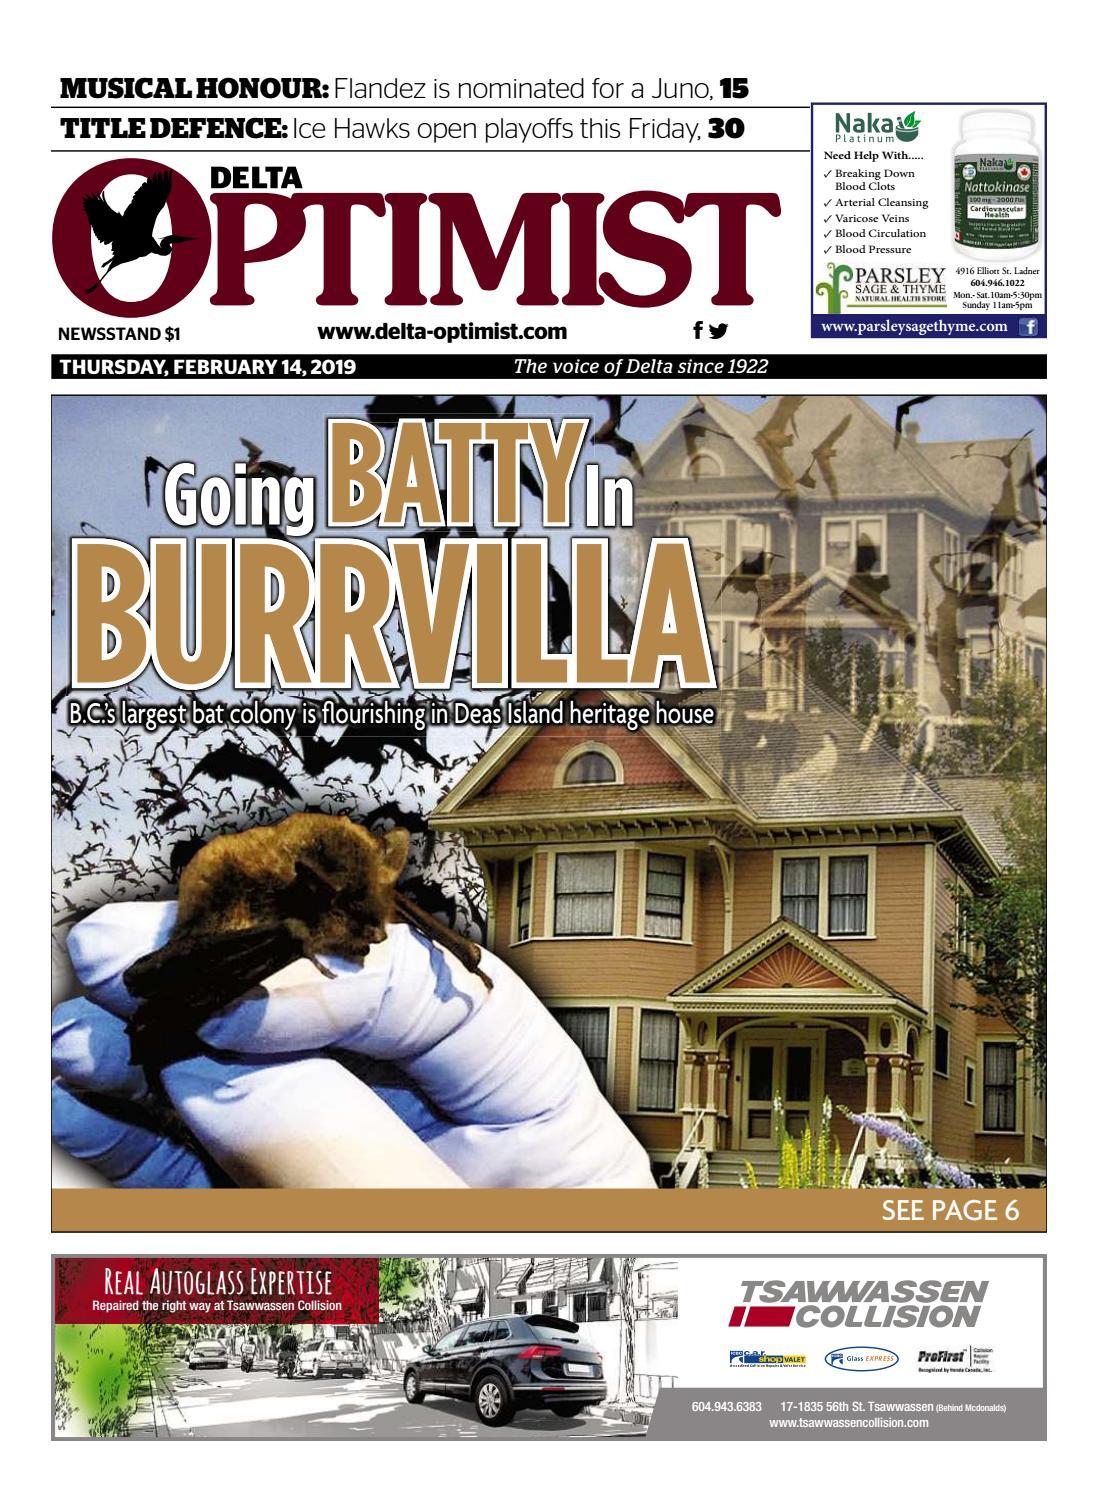 Delta Optimist February 14 2019 by Delta Optimist - issuu